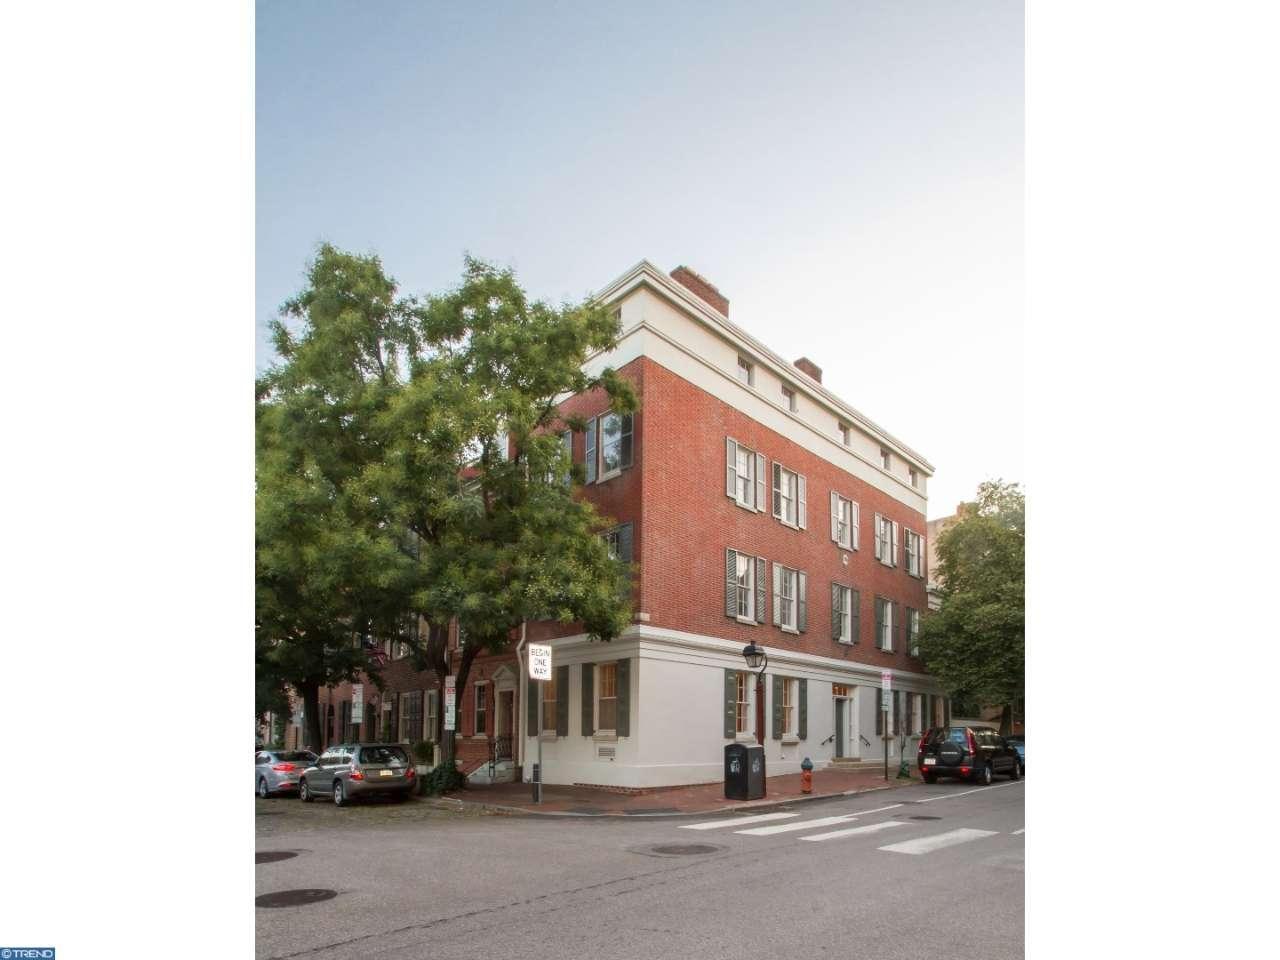 Property for sale at 200 SPRUCE ST, Philadelphia,  PA 19106